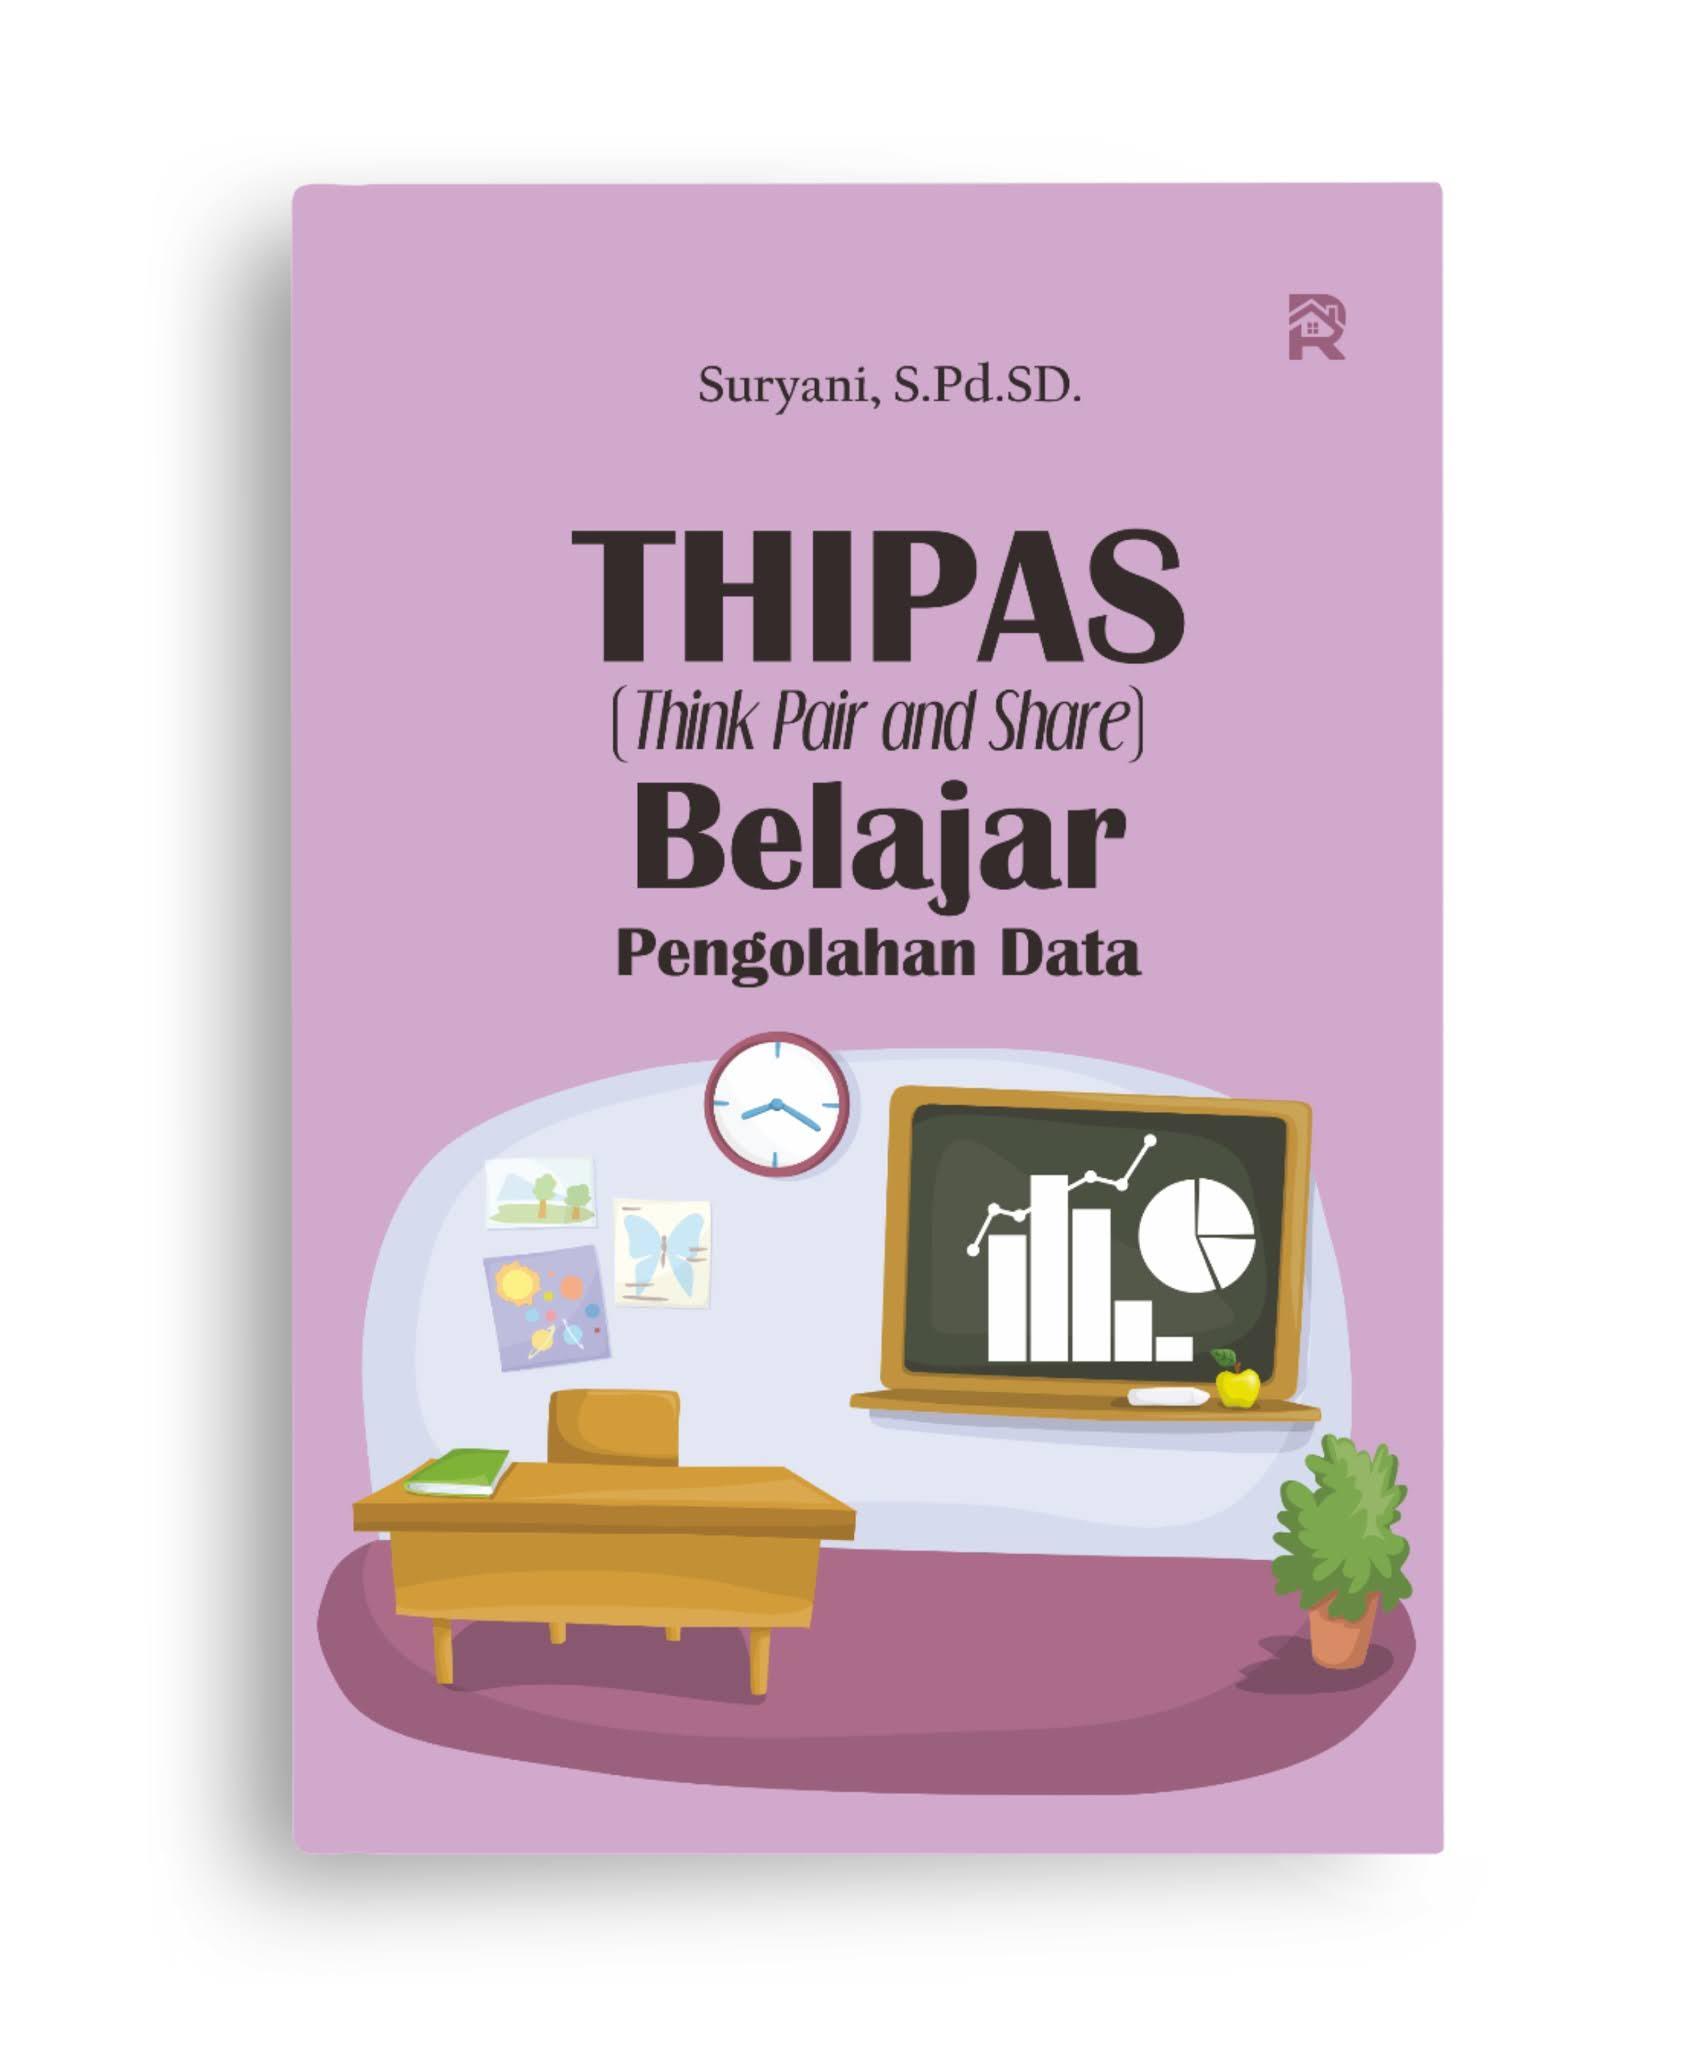 THIPAS (Think Pair and Share) Belajar Pengolahan Data